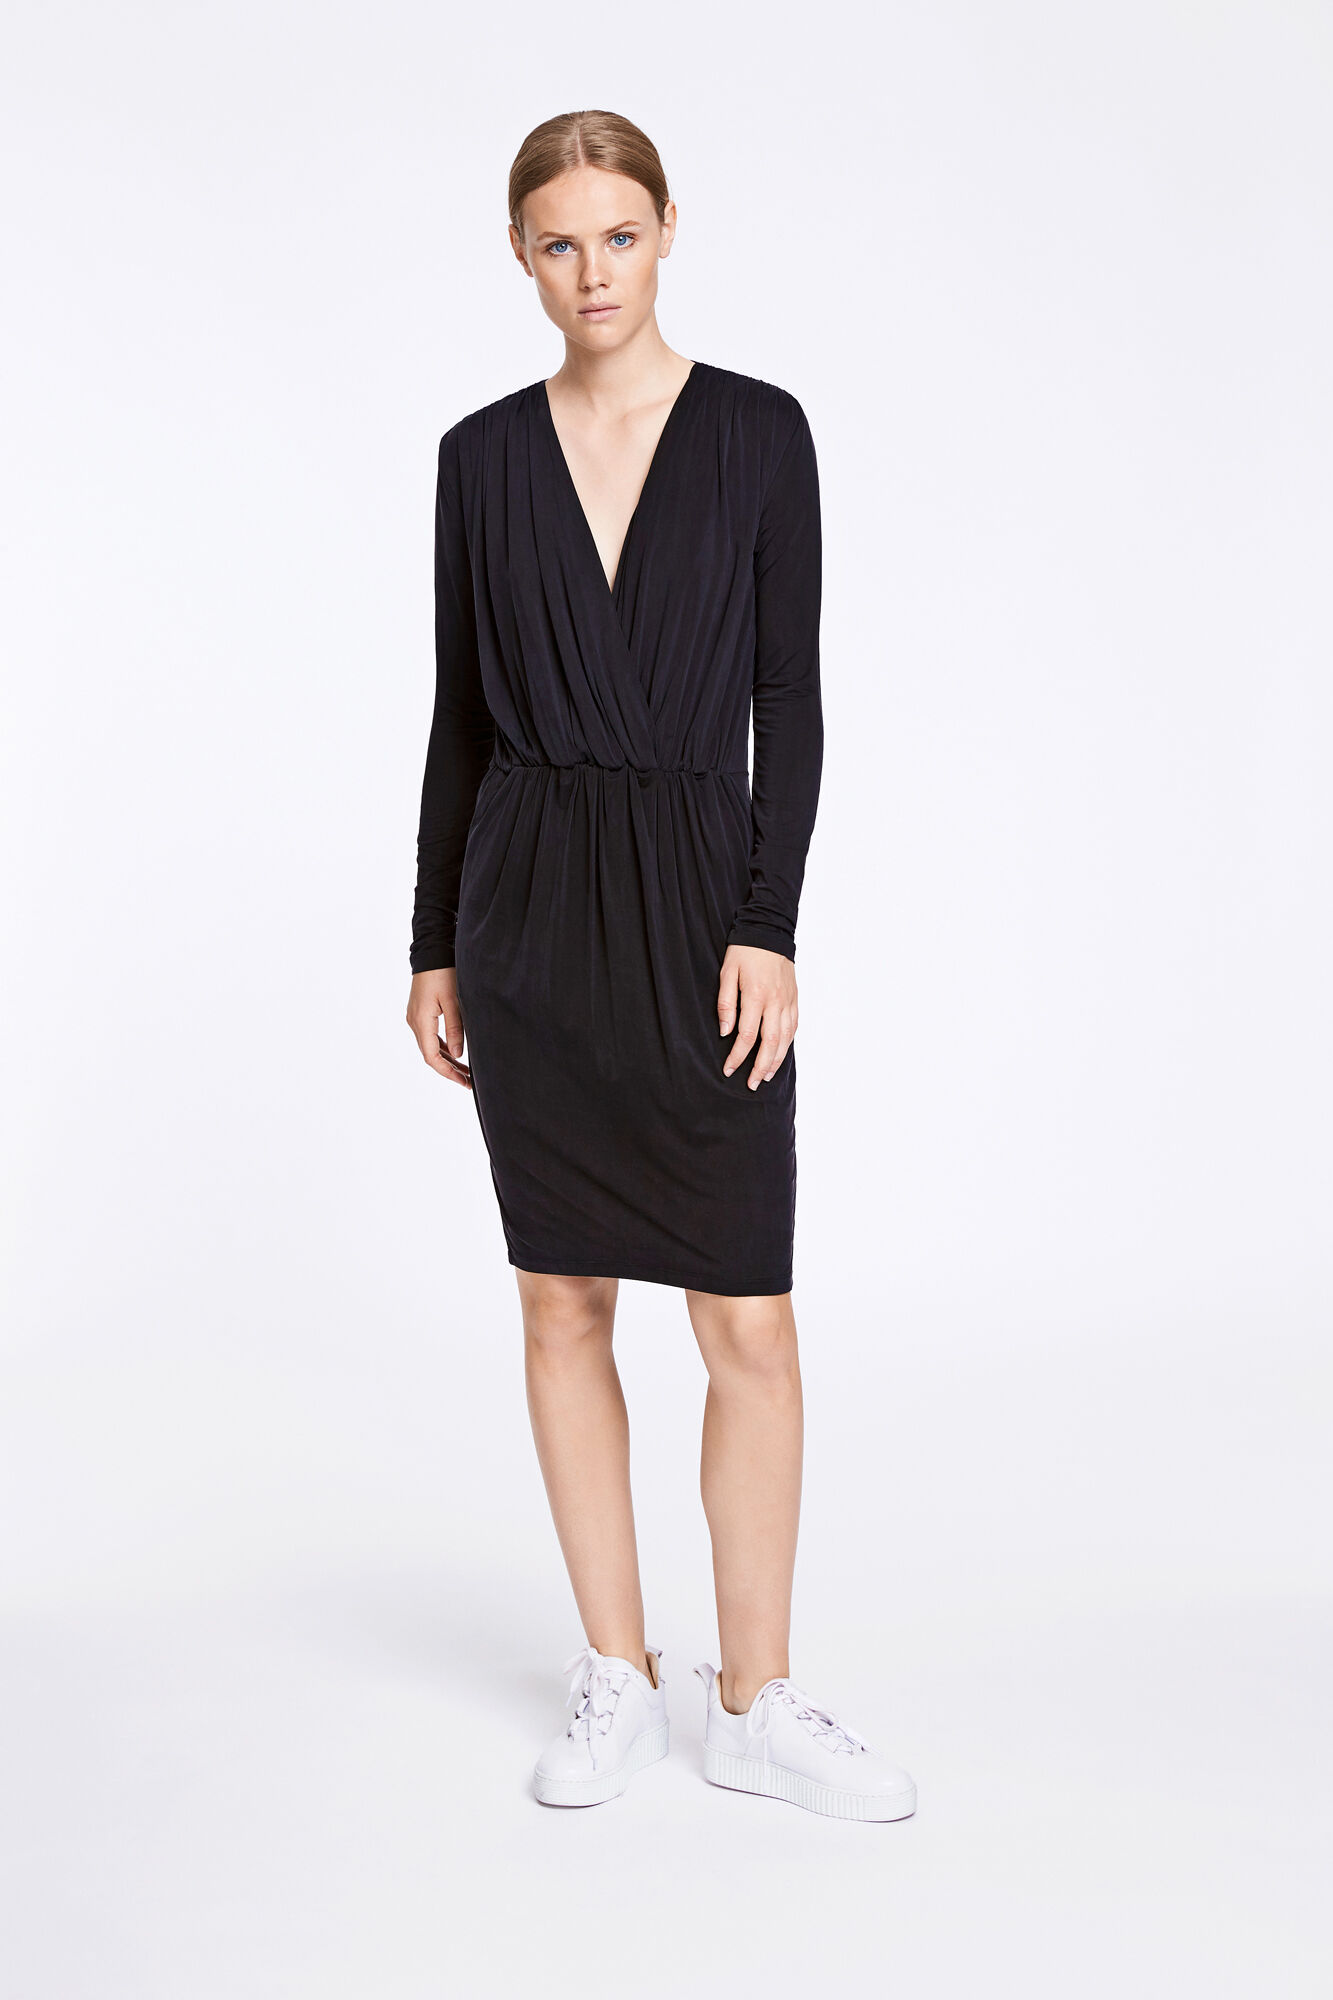 Trinny v-n dress 6202